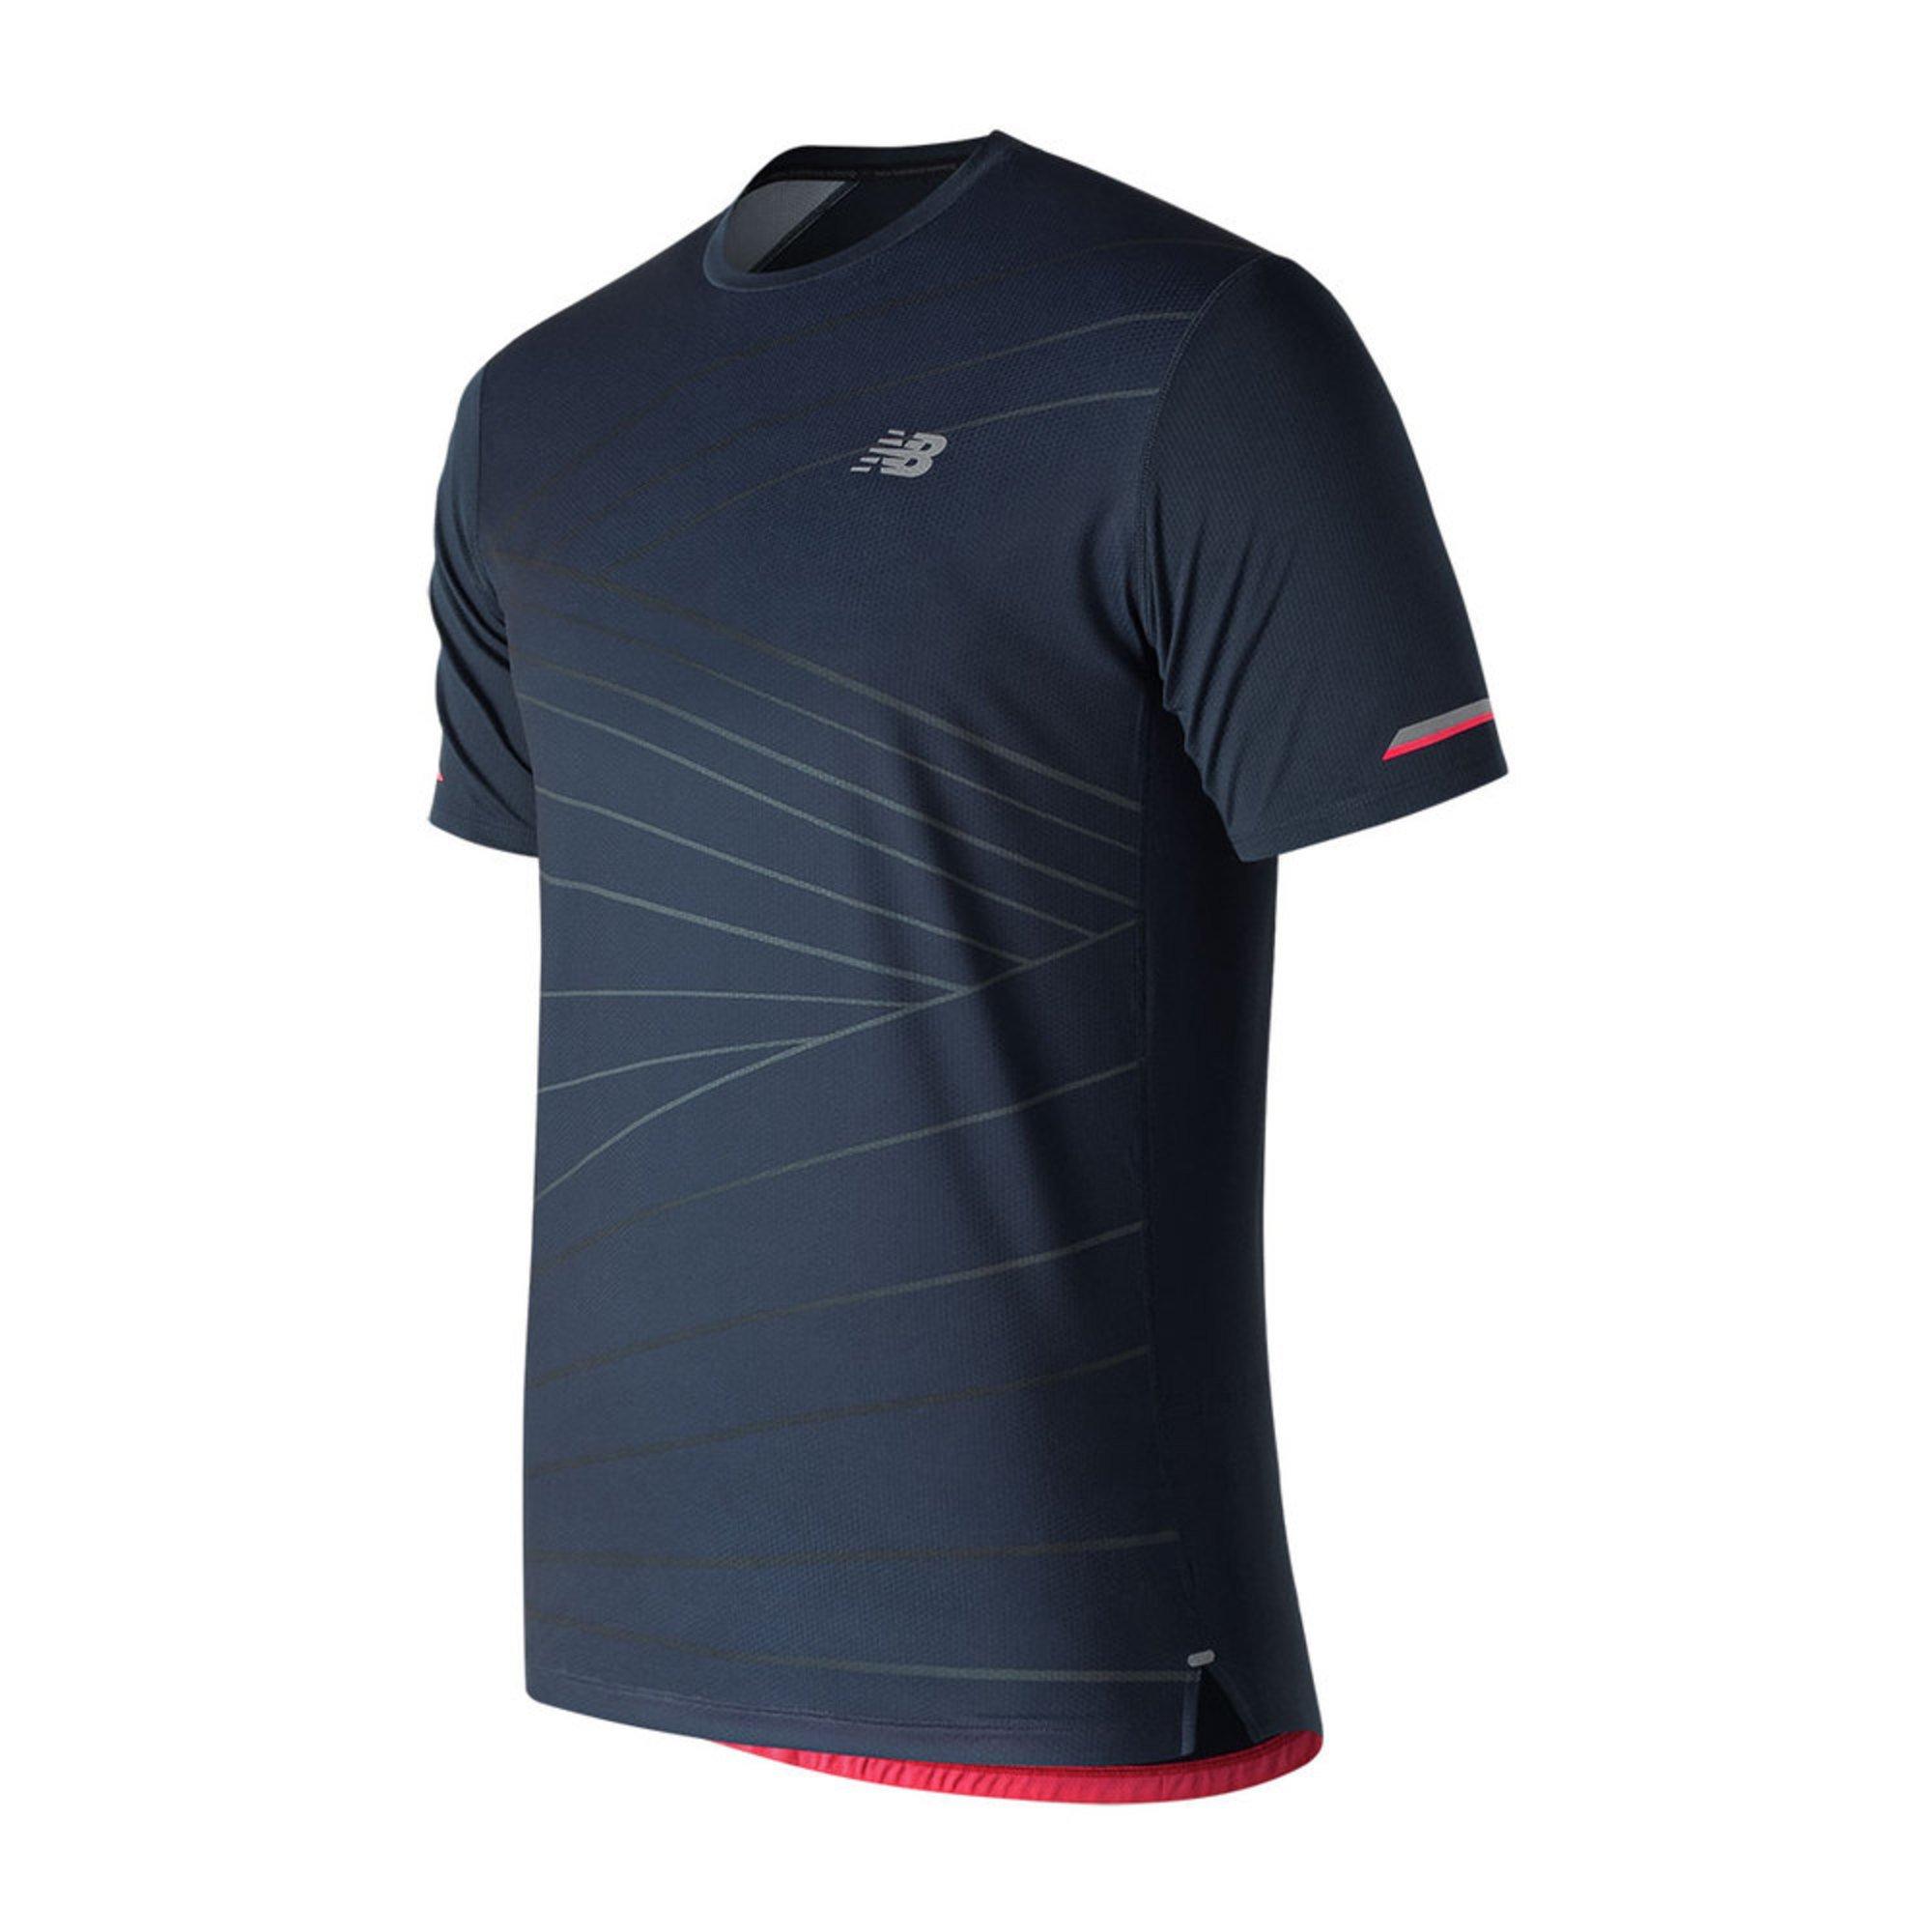 2cba5c6a725af New Balance Men's Ice 2.0 Short Sleeve Shirt | Active Tees | Apparel ...